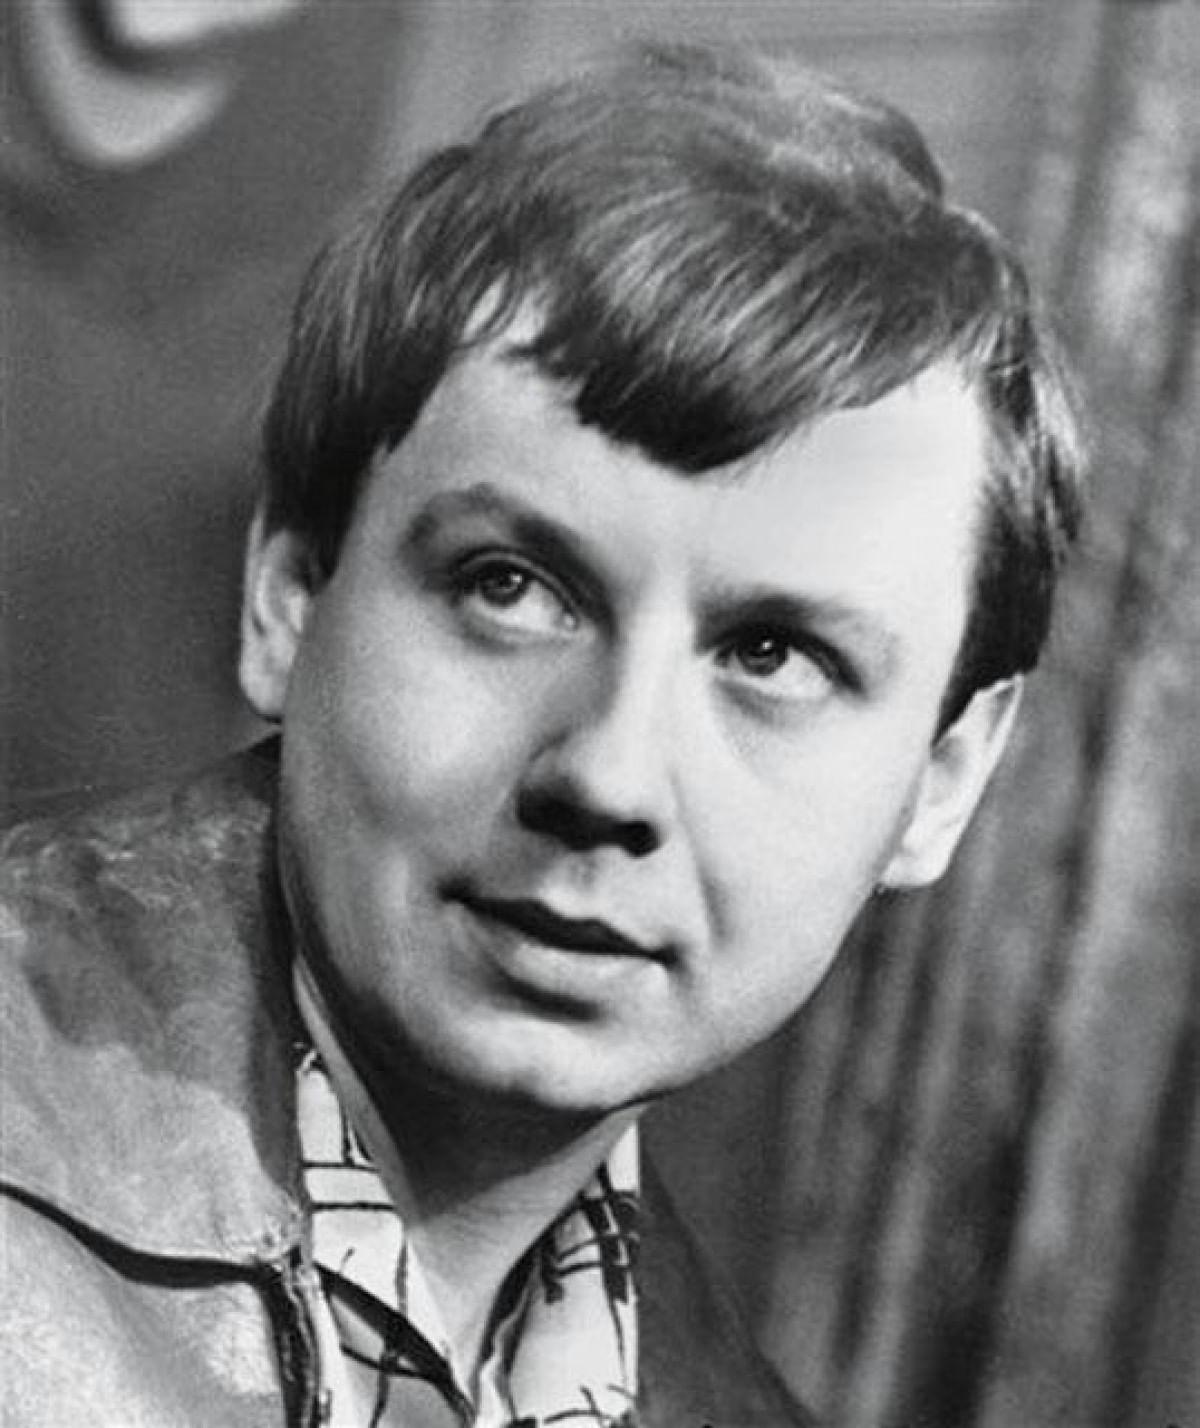 Олег Табаков в молодости